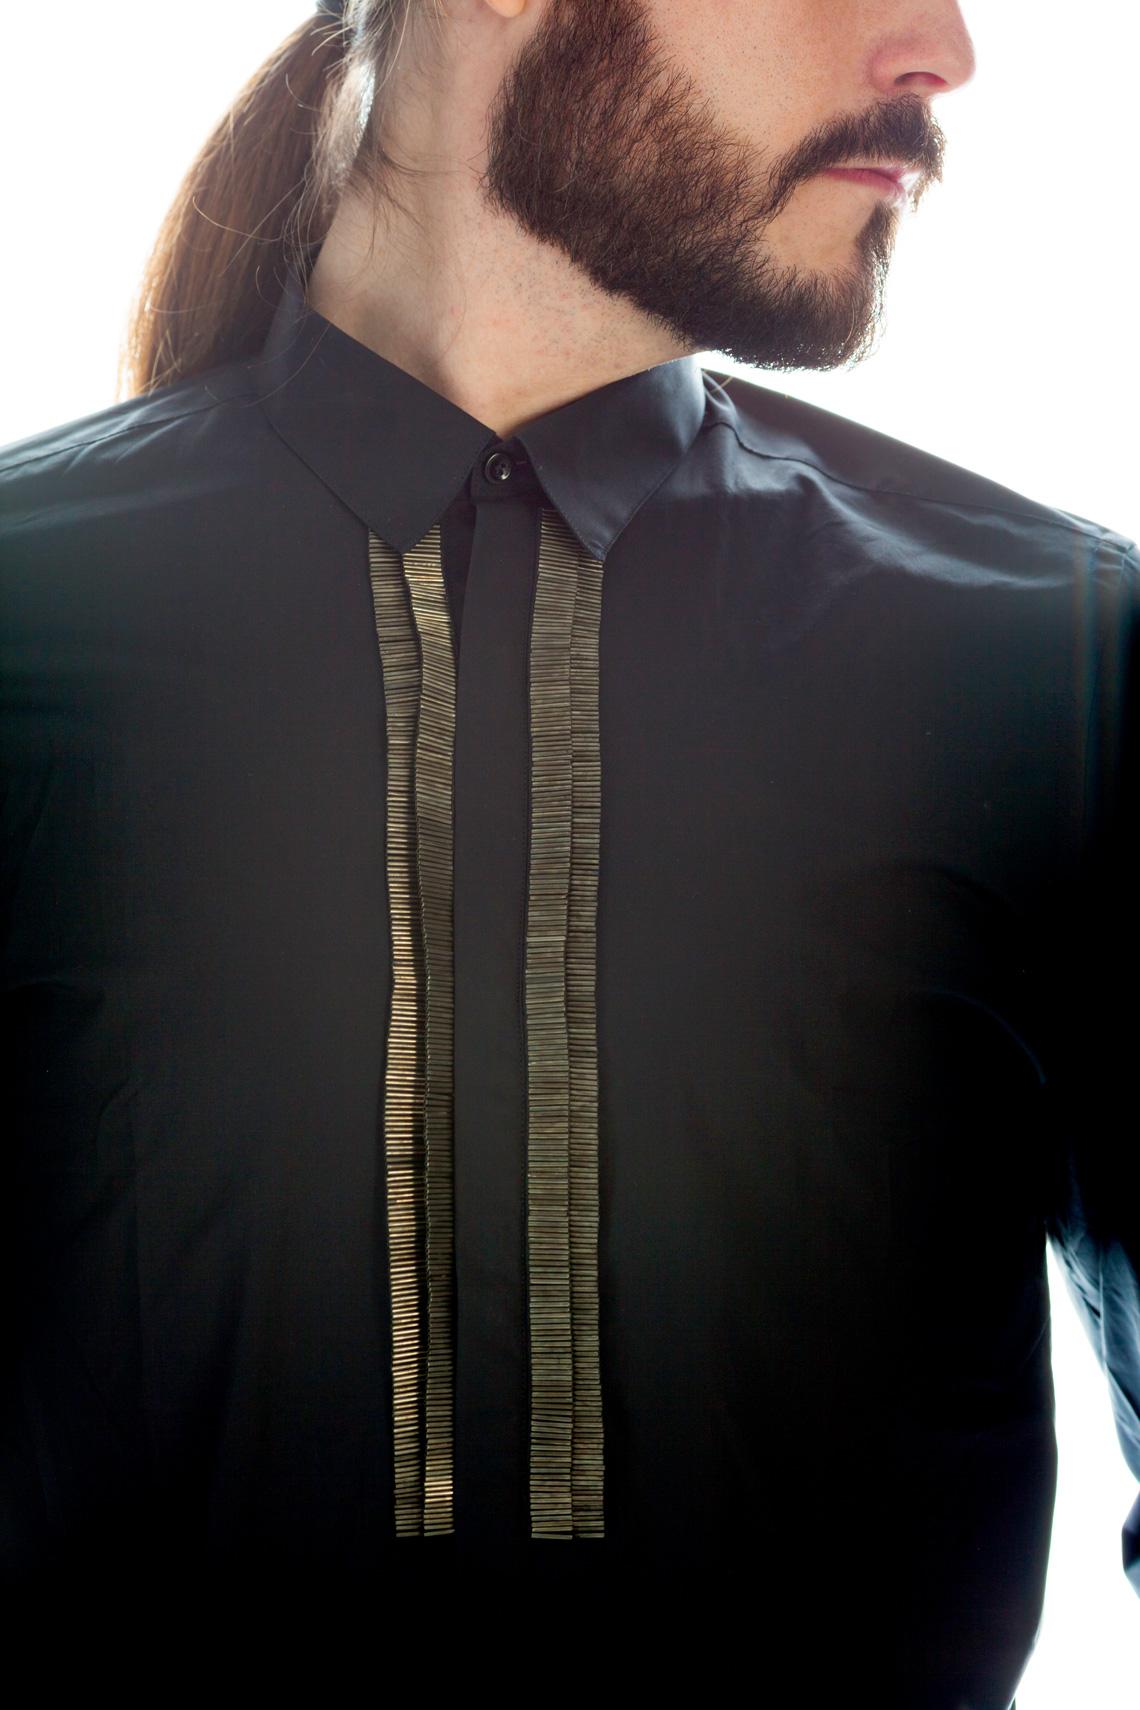 Kaisers-neue-Kleider_Fashionblog-Outfit_Weisser-Anzug_James_Bond_Hemd_The-Kooples